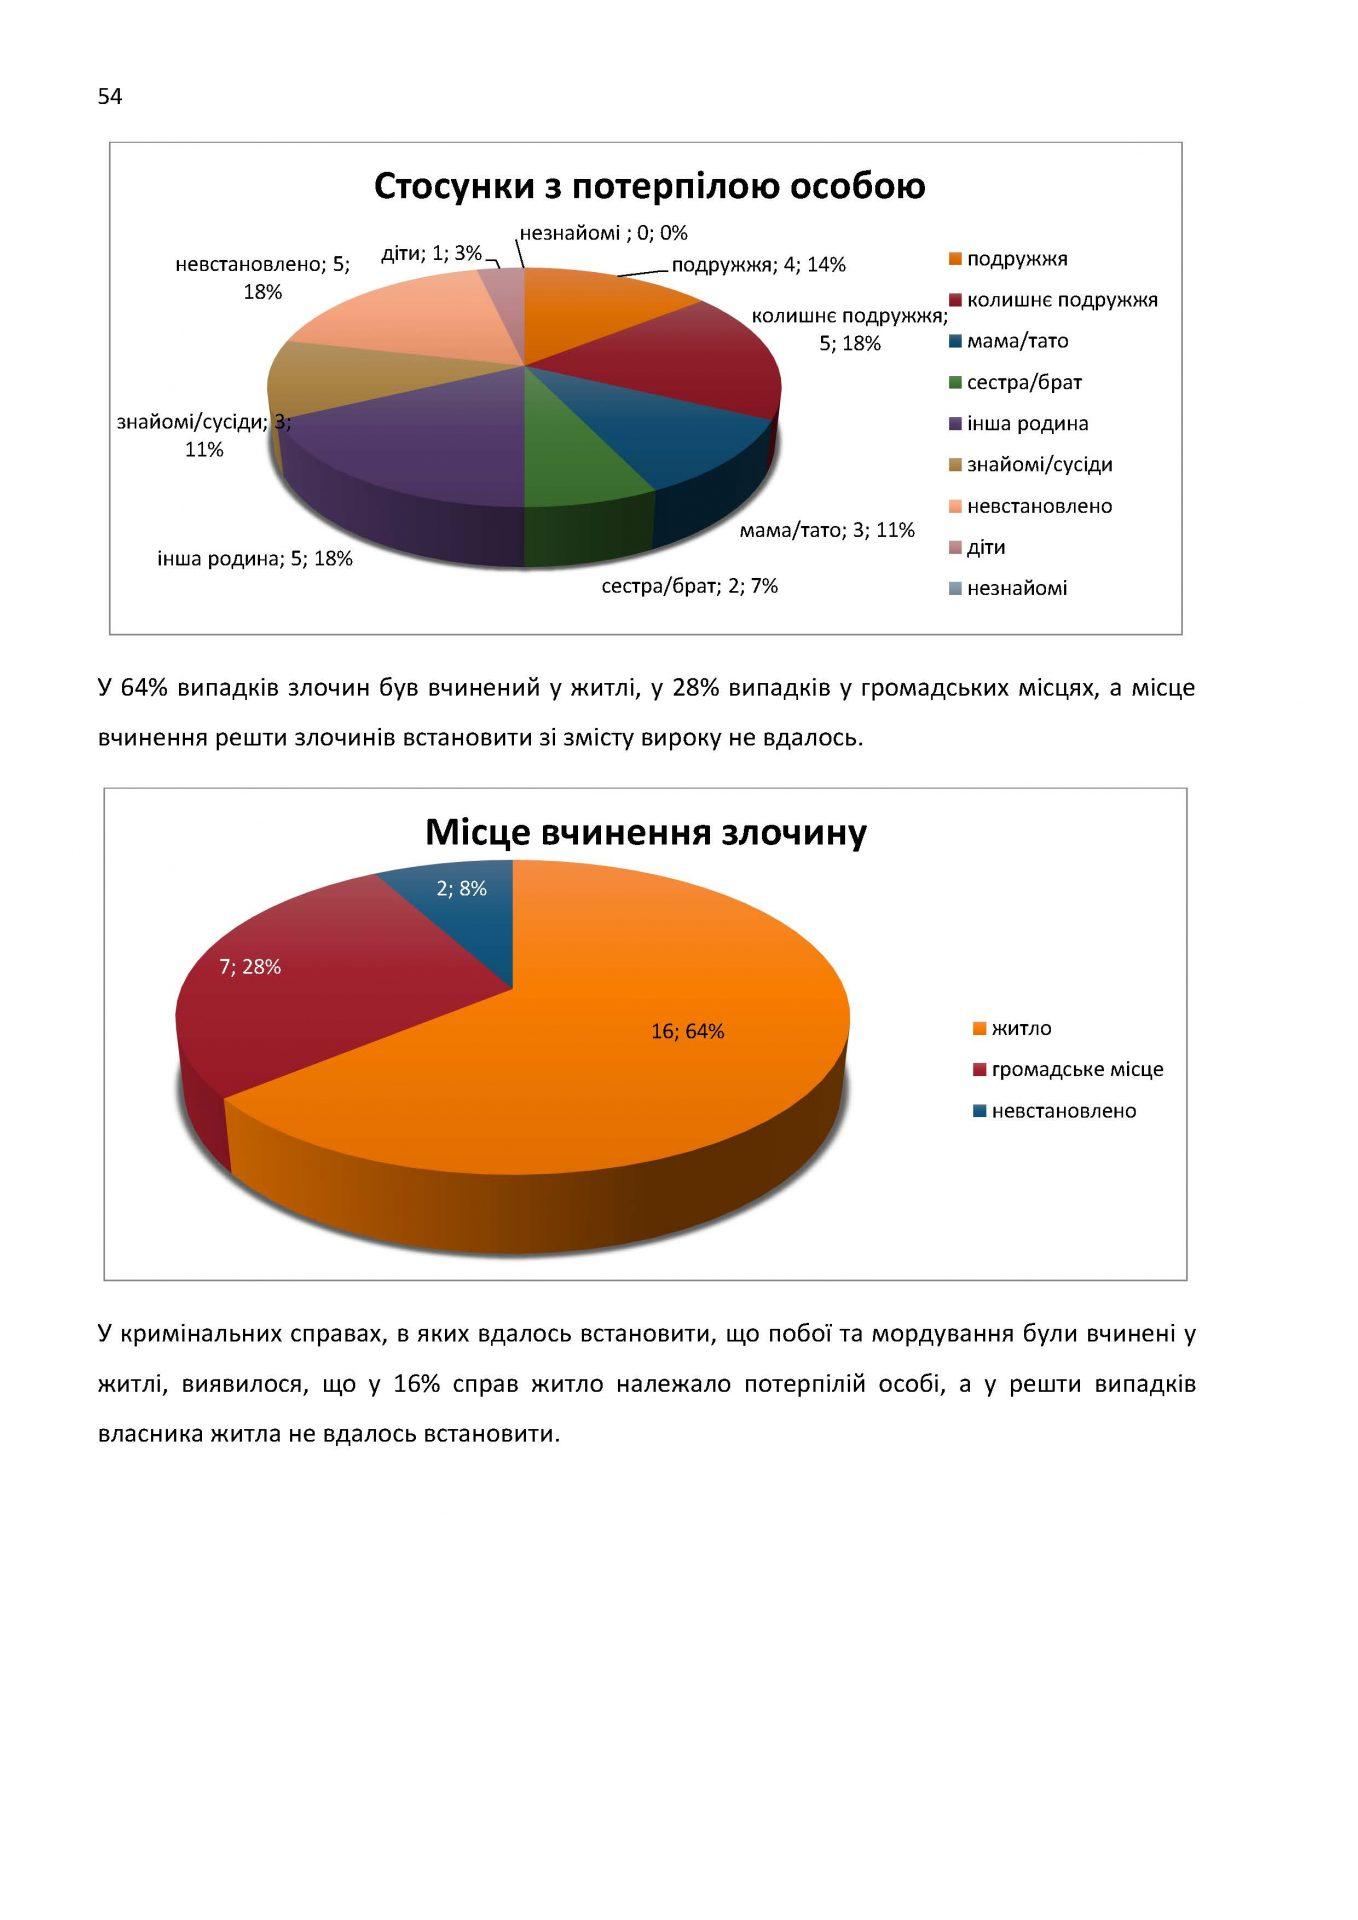 Draft Report monitoring print USAID_Страница_54